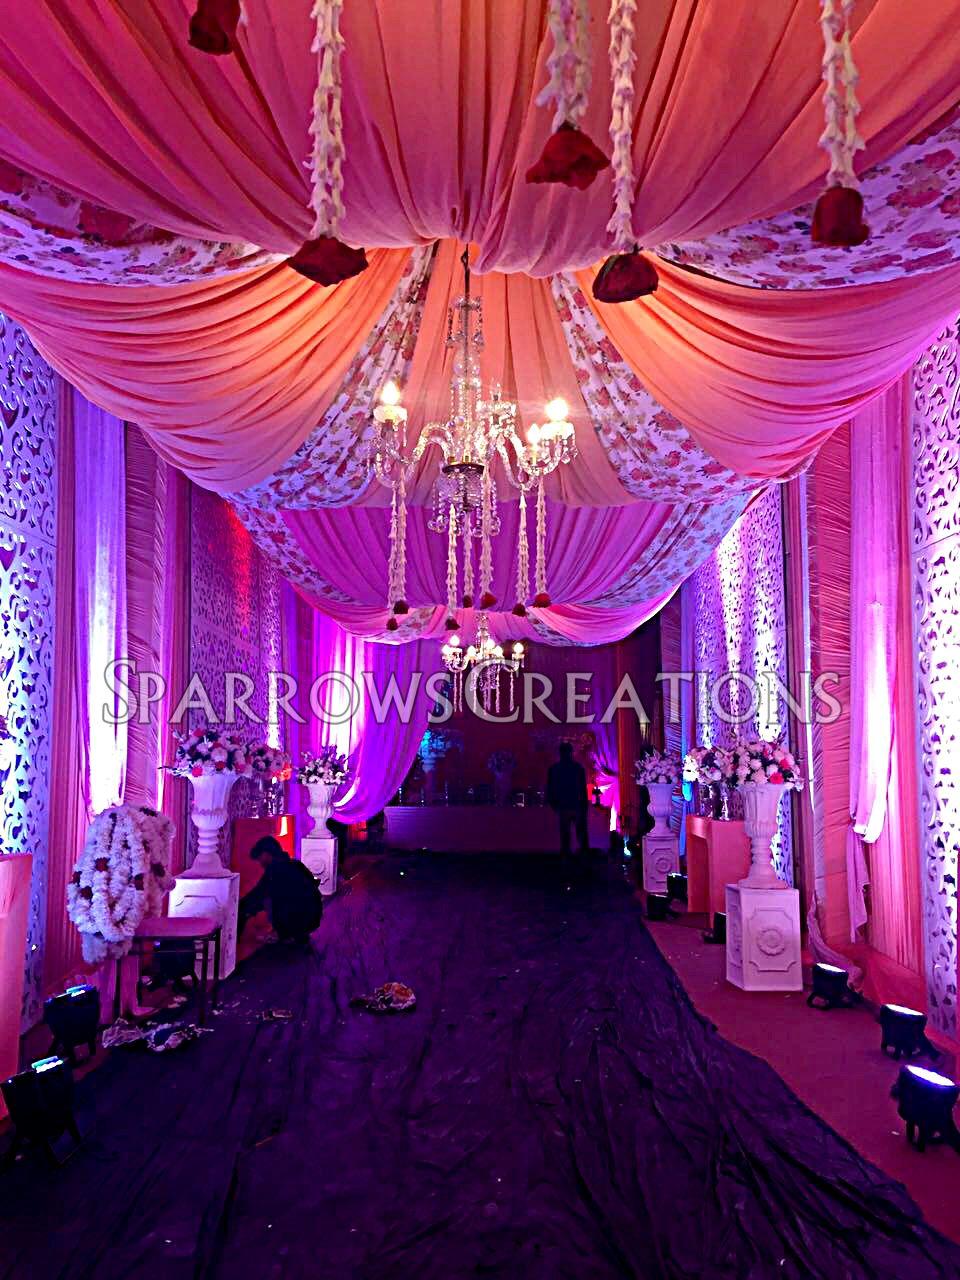 Pin by aanuoo sparrows on Wedding Decor Ideas | Pinterest | Weddings